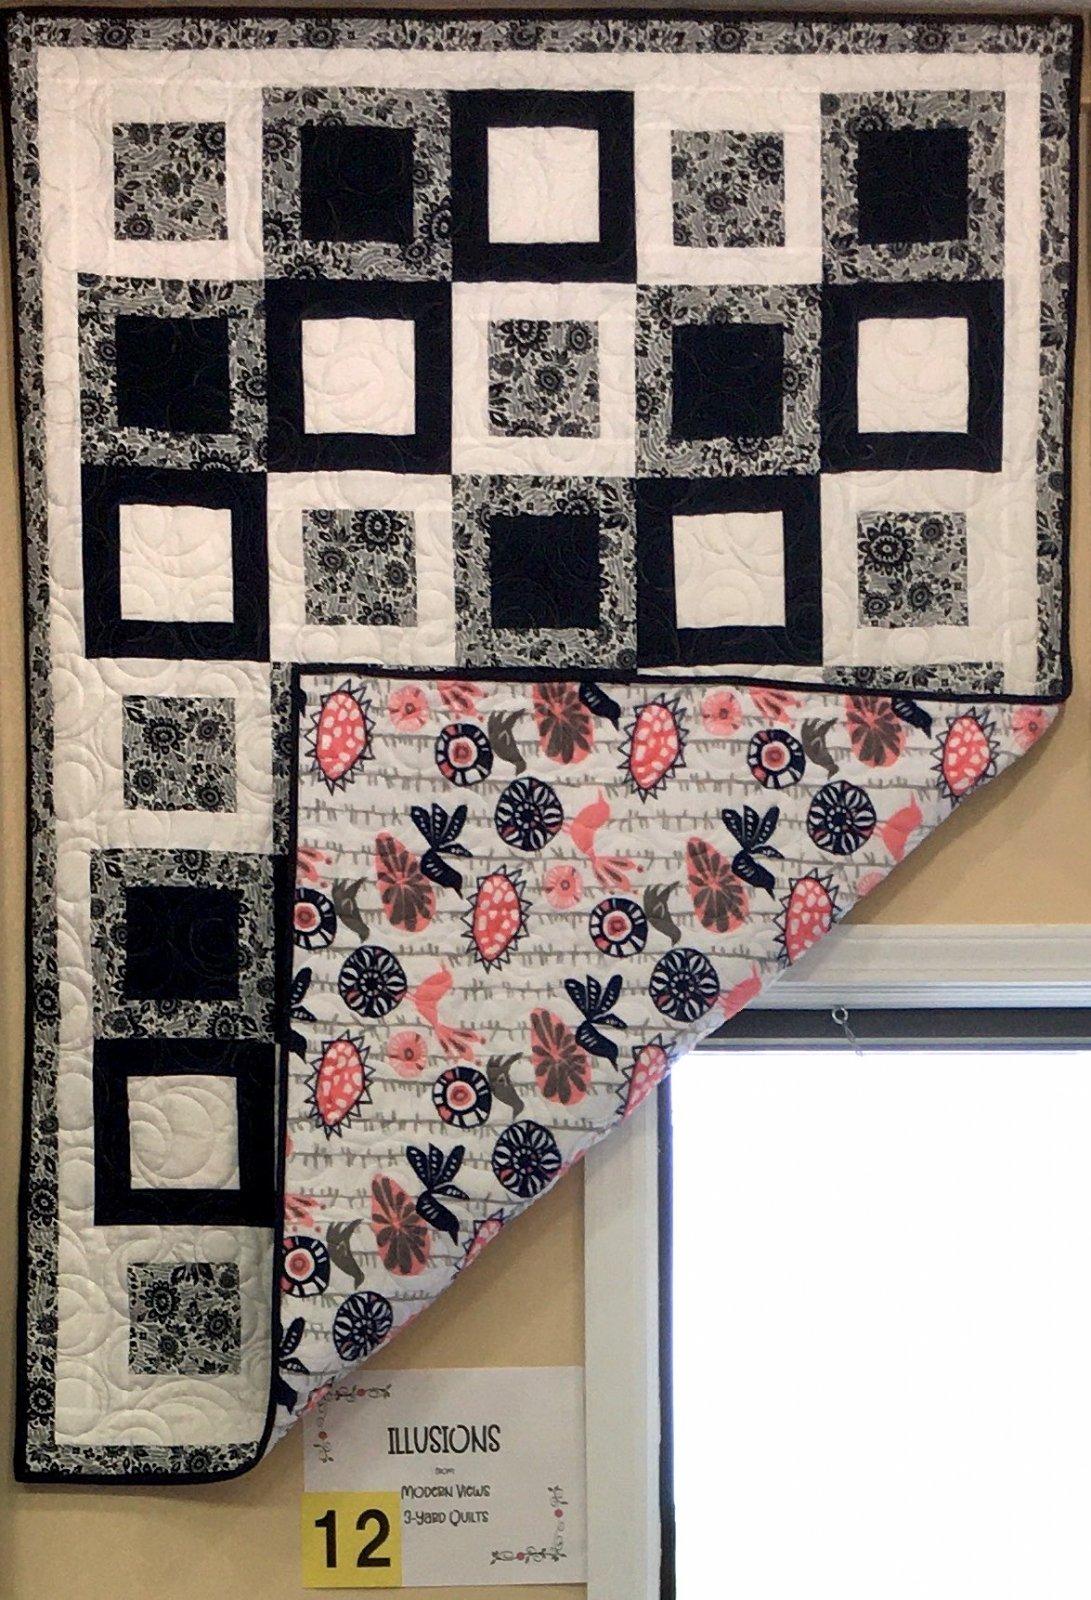 Illusions Fabric Kit #12